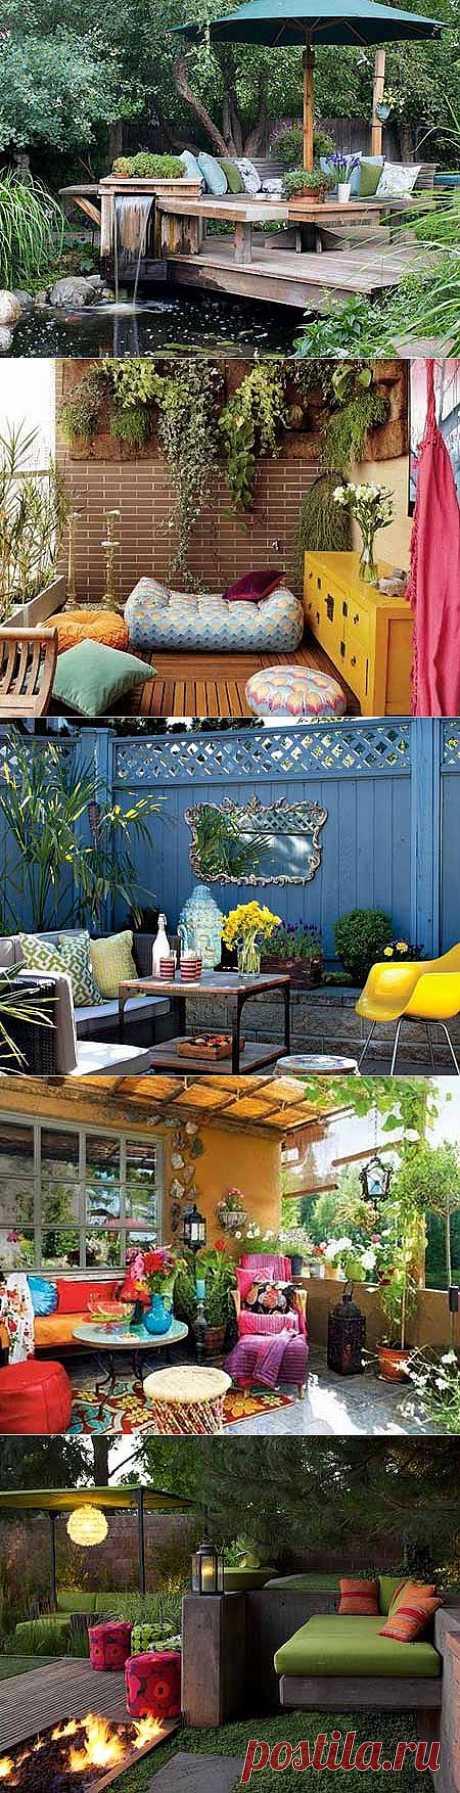 Дизайн сада своими руками: 10 ярких патио